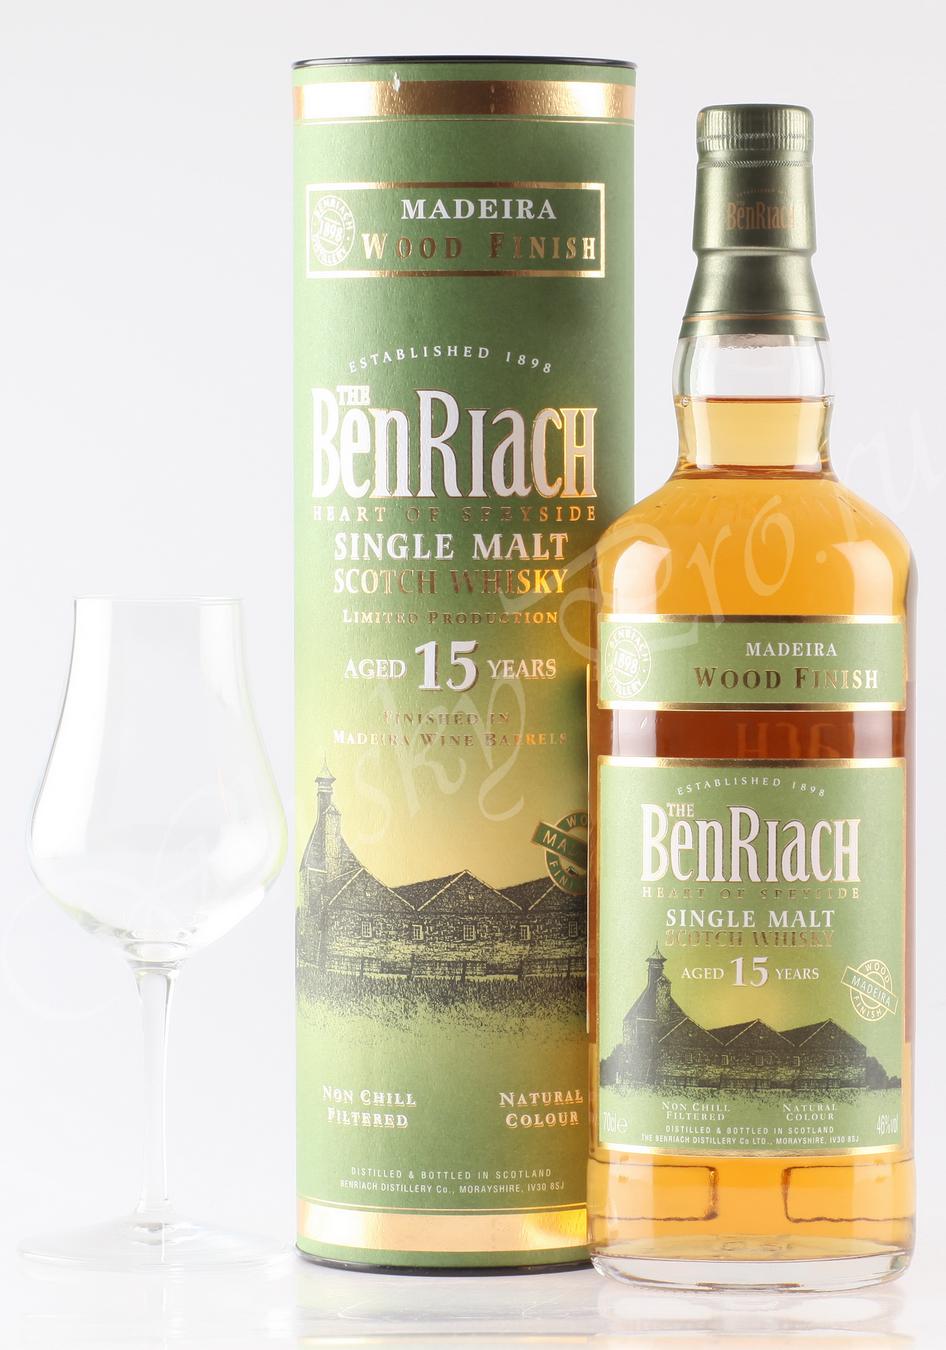 виски односолодовый Бенриах Мадера 15 лет Шотландский виски Benriach 15 years